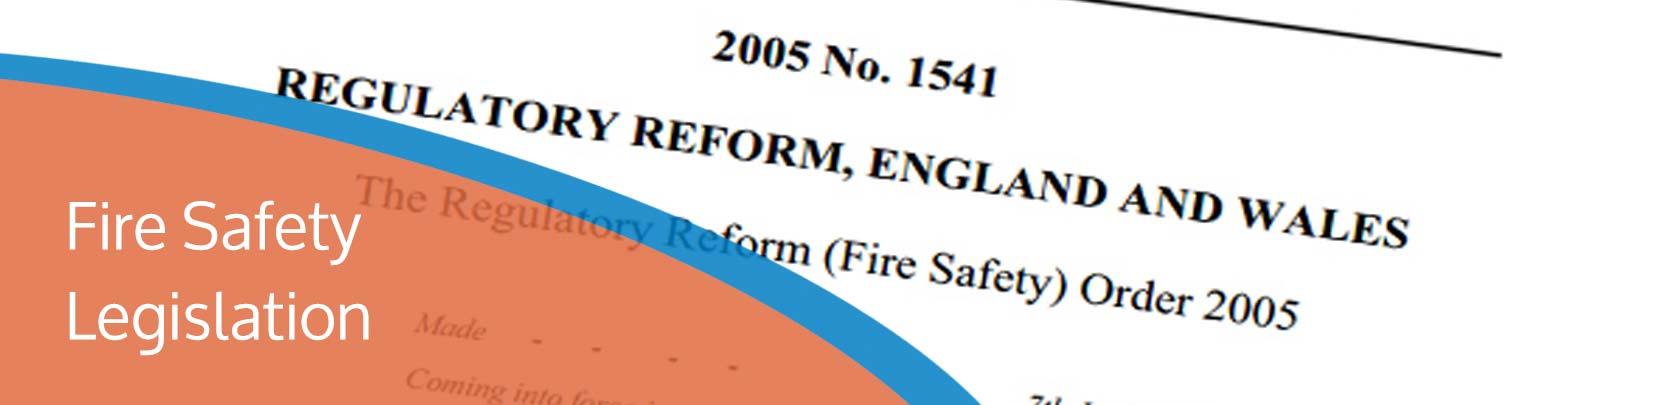 legislation hero image for mi fire protection services